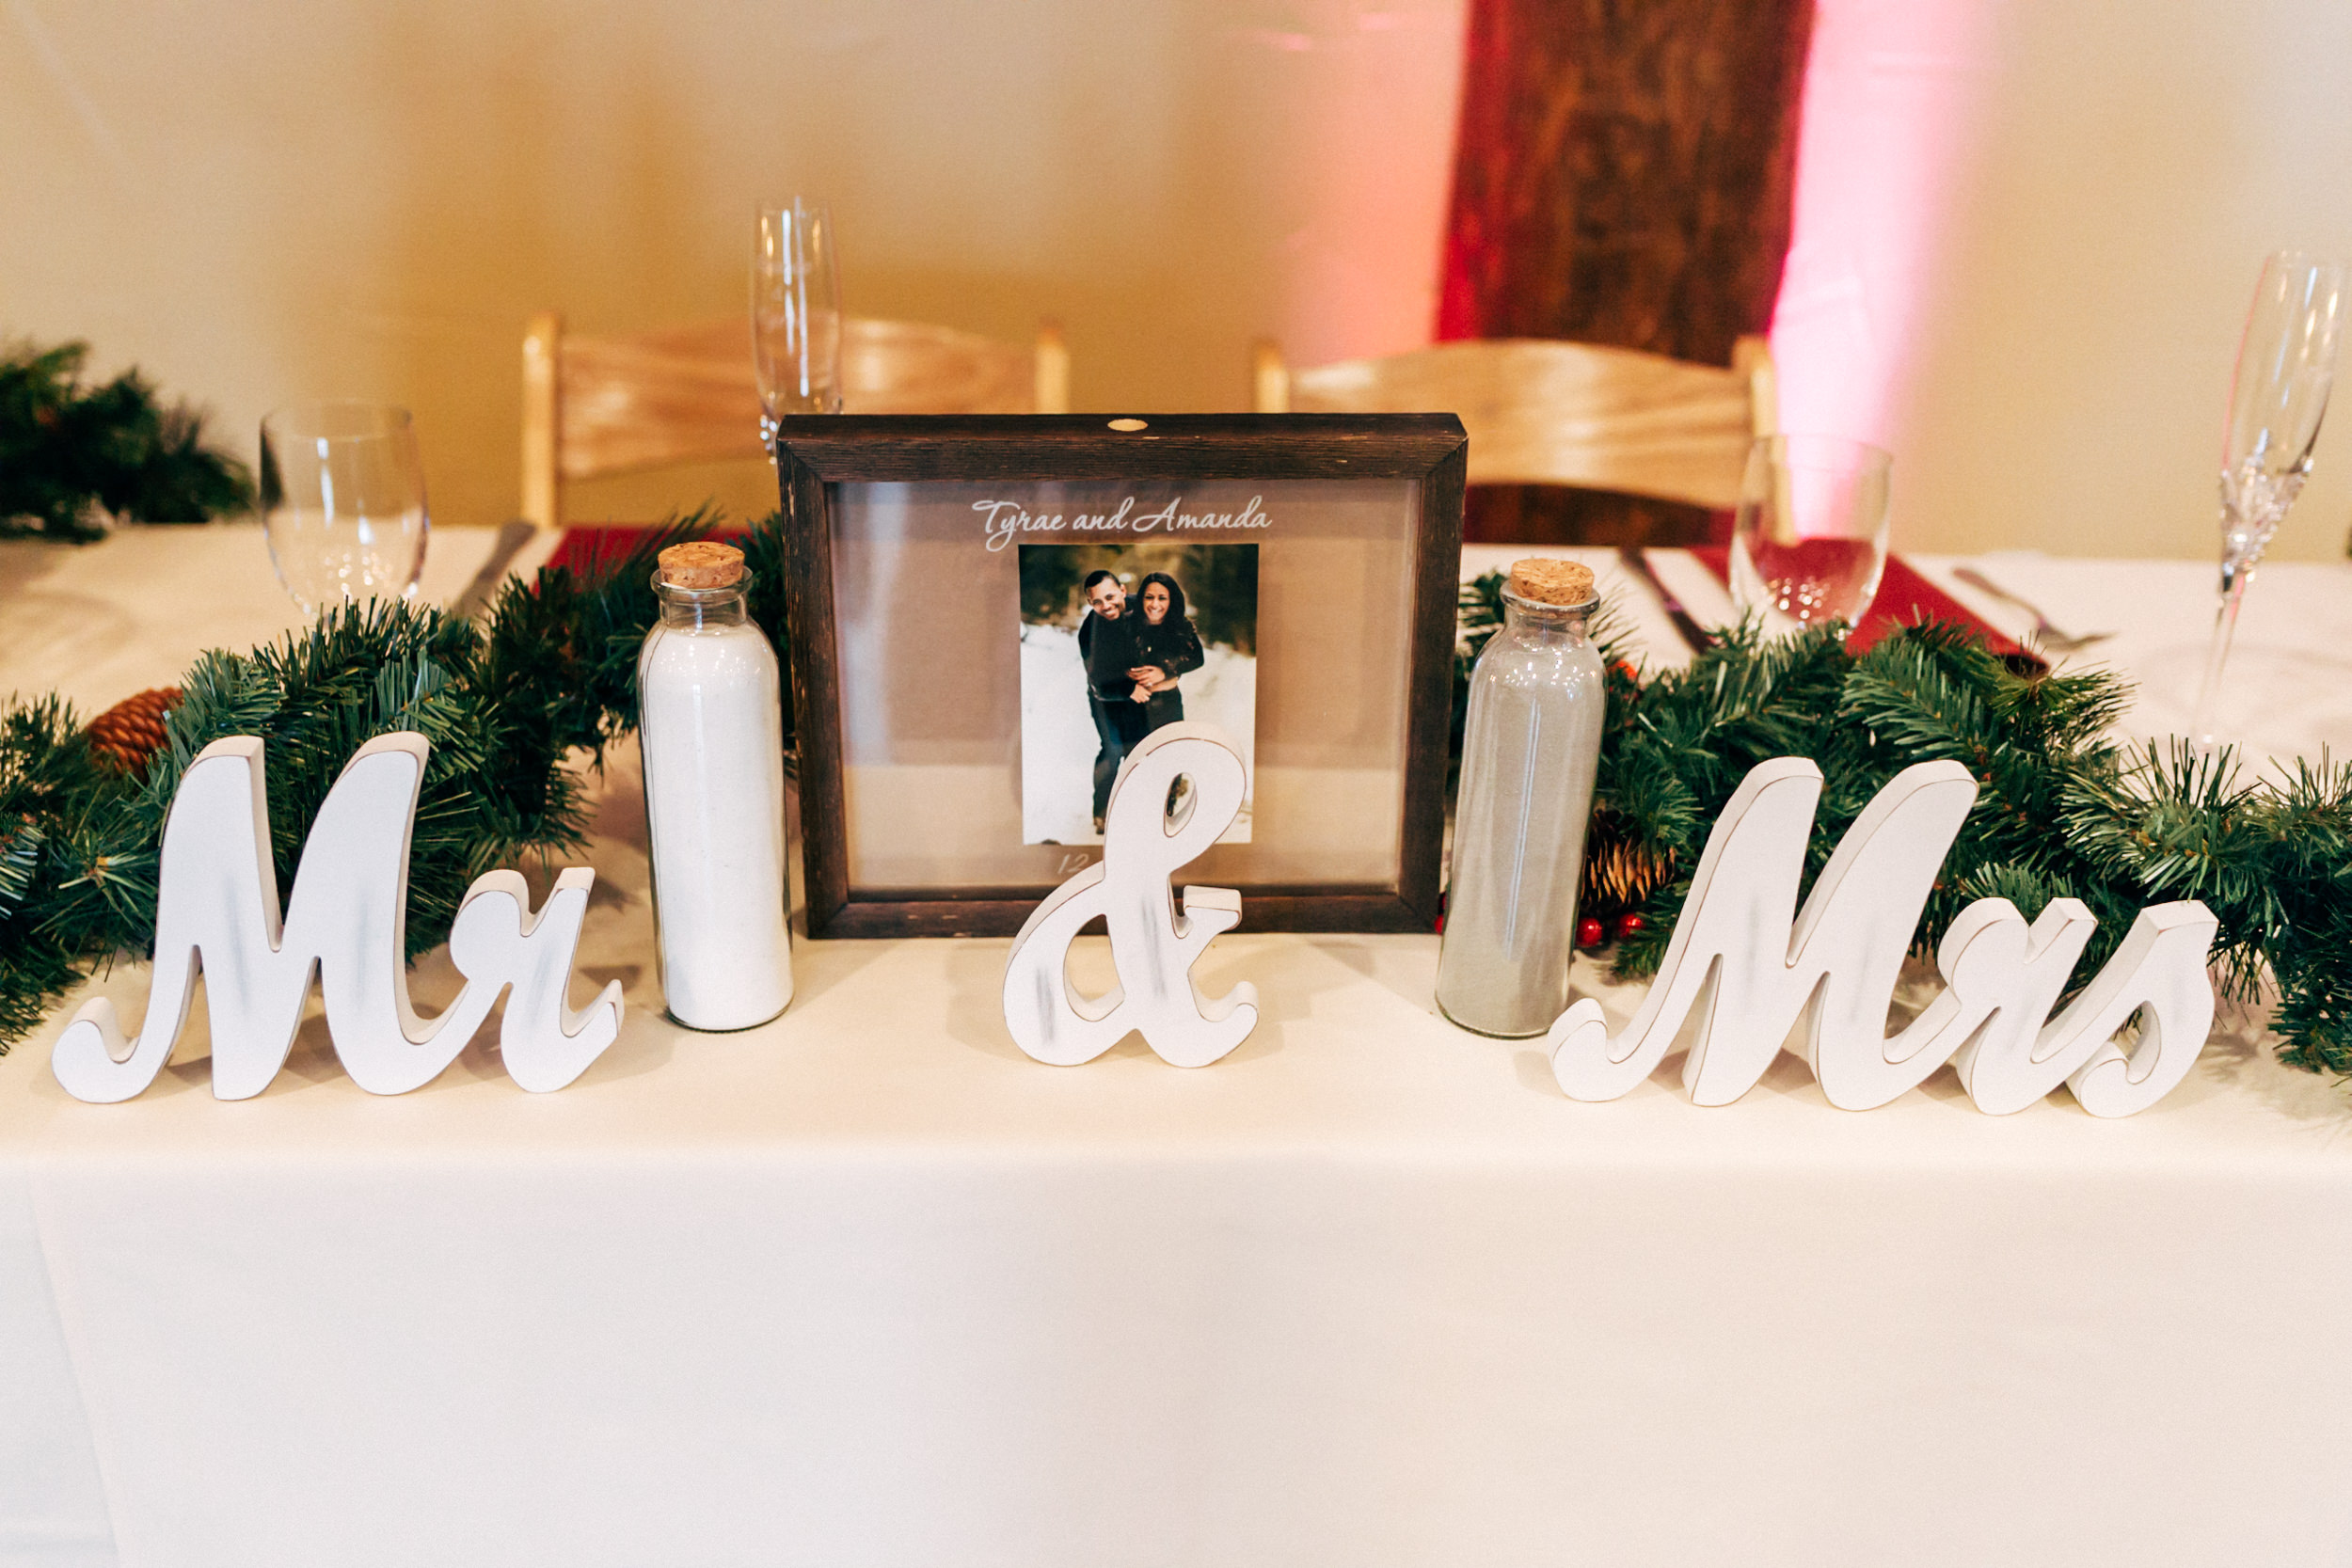 Colorado-Wedding-Photographer-Breckinridge-Mountain-Adventure-Elopement-64.jpg